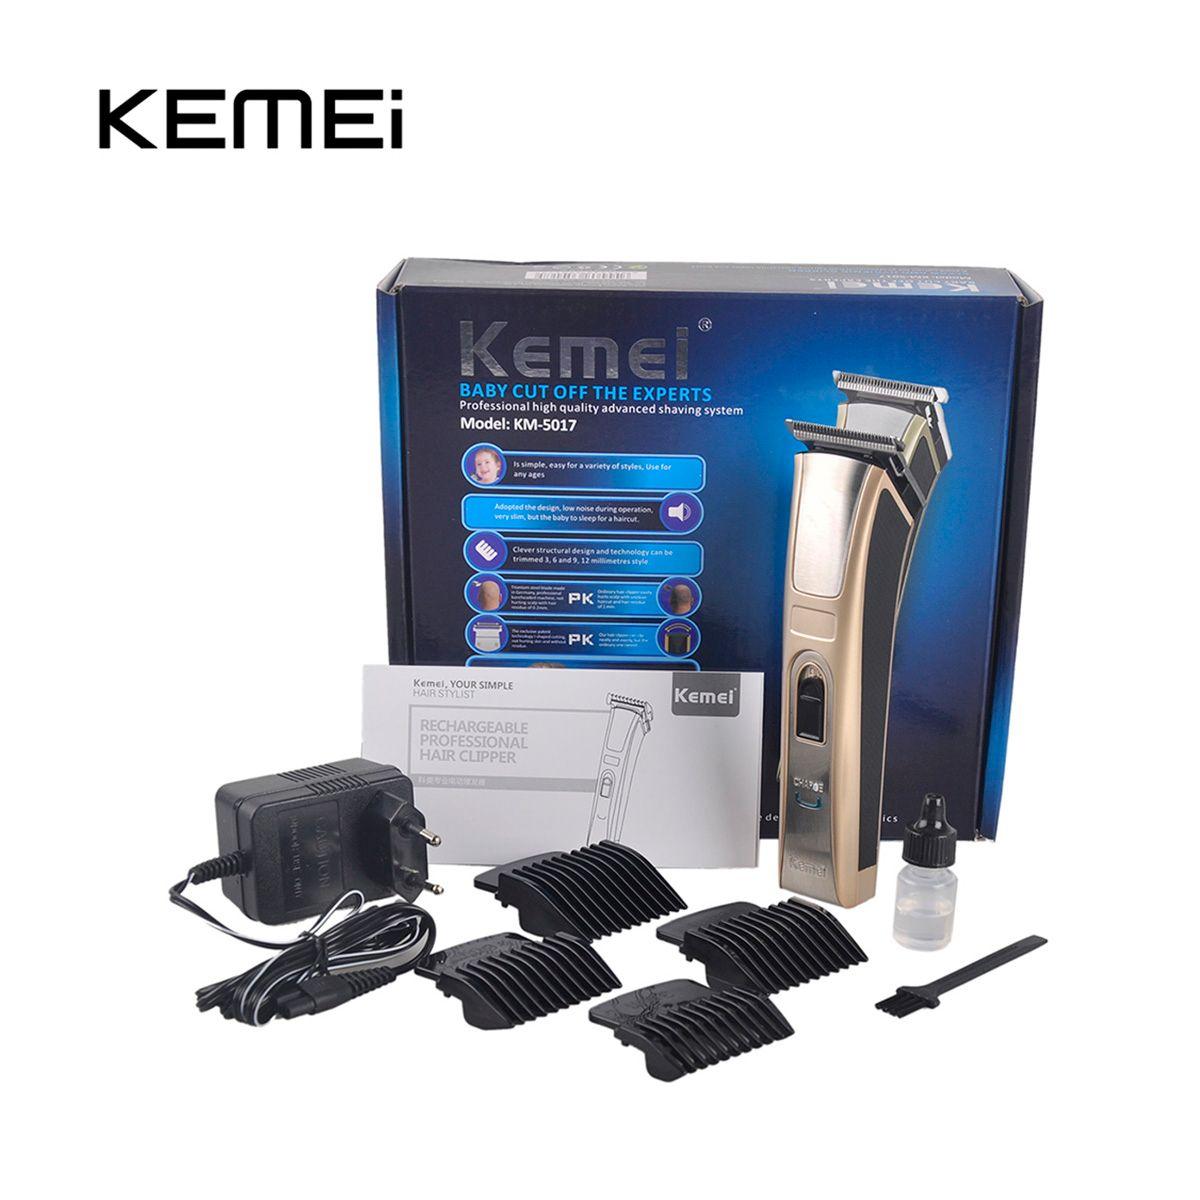 http://www.dhresource.com/0x0s/f2-albu-g4-M01-90-F3-rBVaEFfeSZ2ACX6BAAONm6CkMh8861.jpg/kemei-km-5017-hair-trimmer-rechargeable-electric.jpg